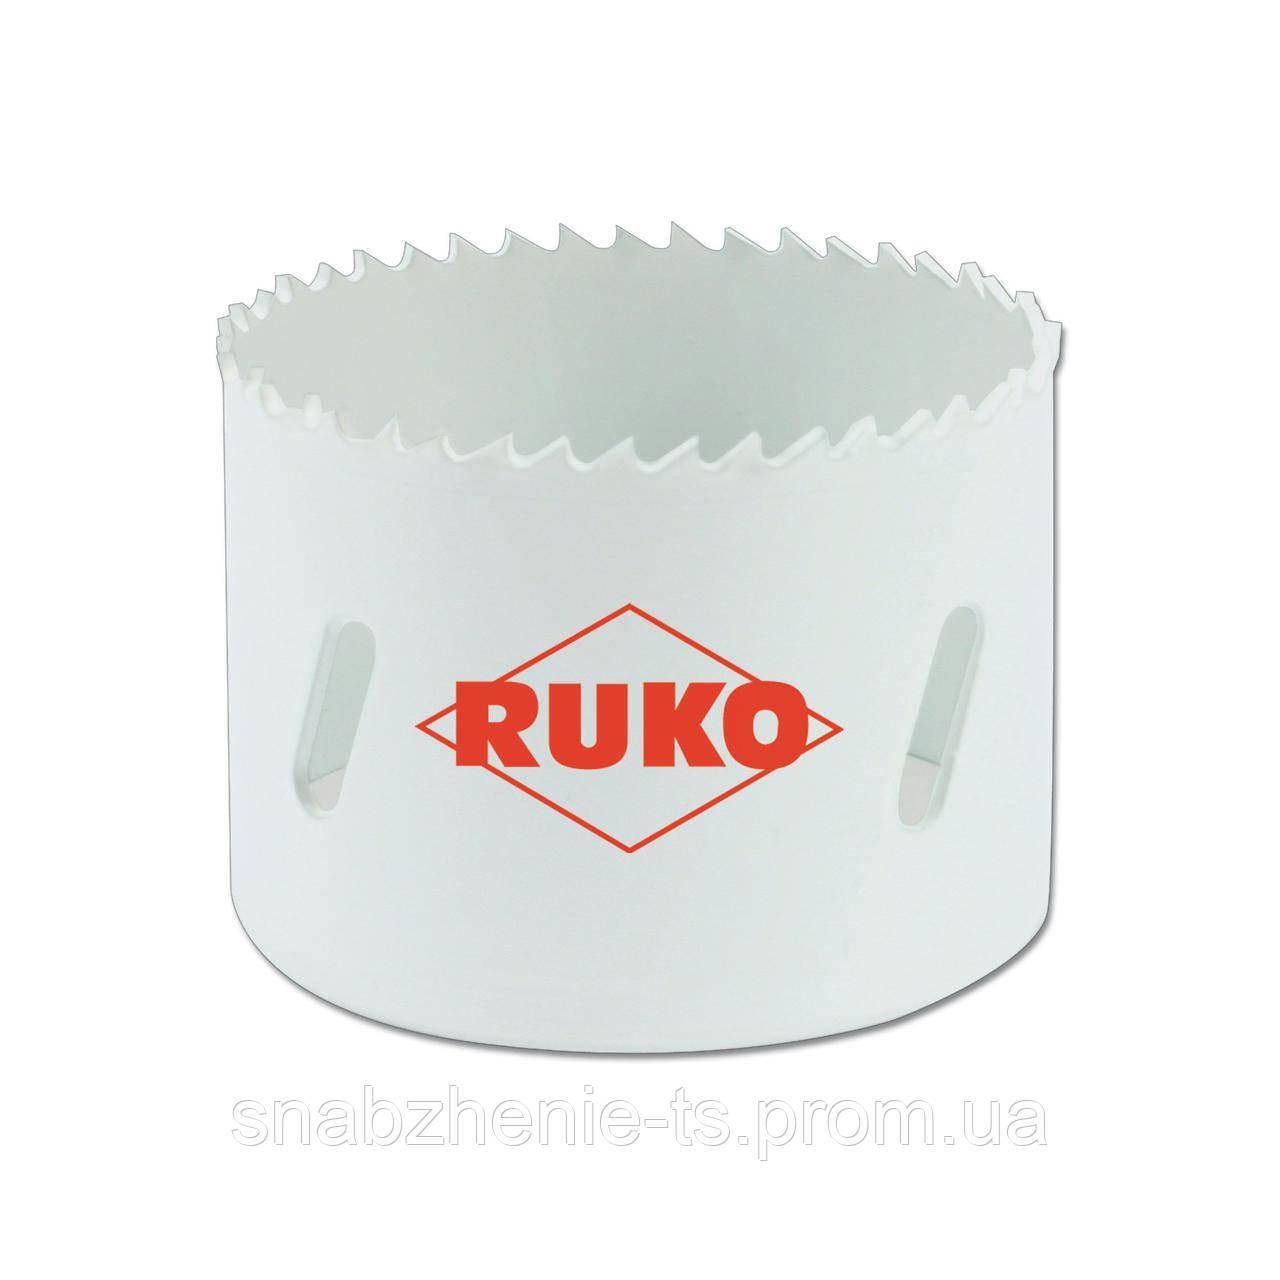 Коронка по металлу 95 мм HSSE-Co 8, биметаллическая c мелкими зубьями, RUKO